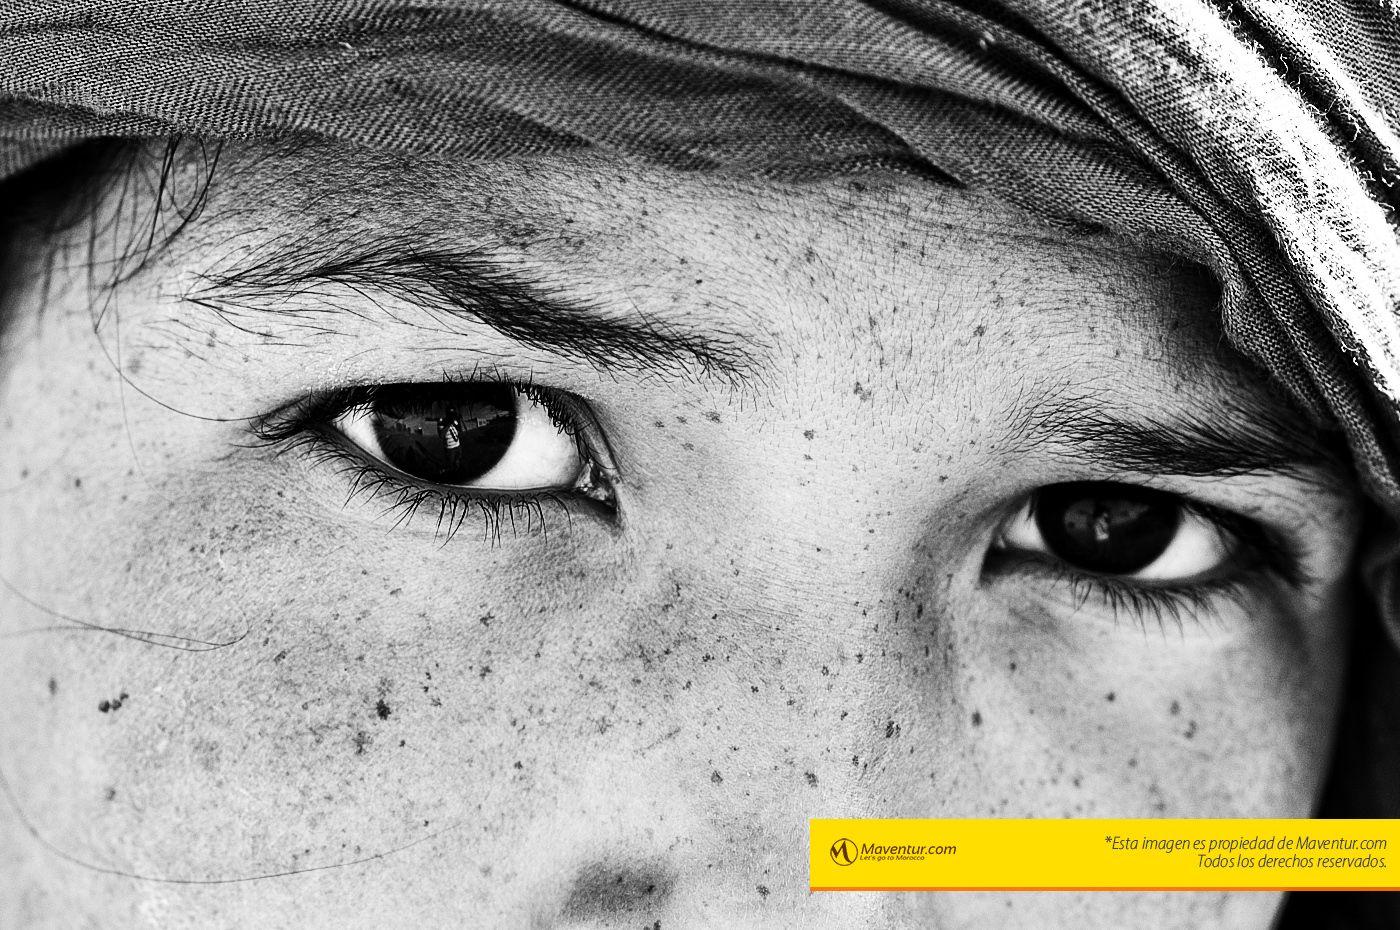 Maventur_viajes de fotografia de retratos